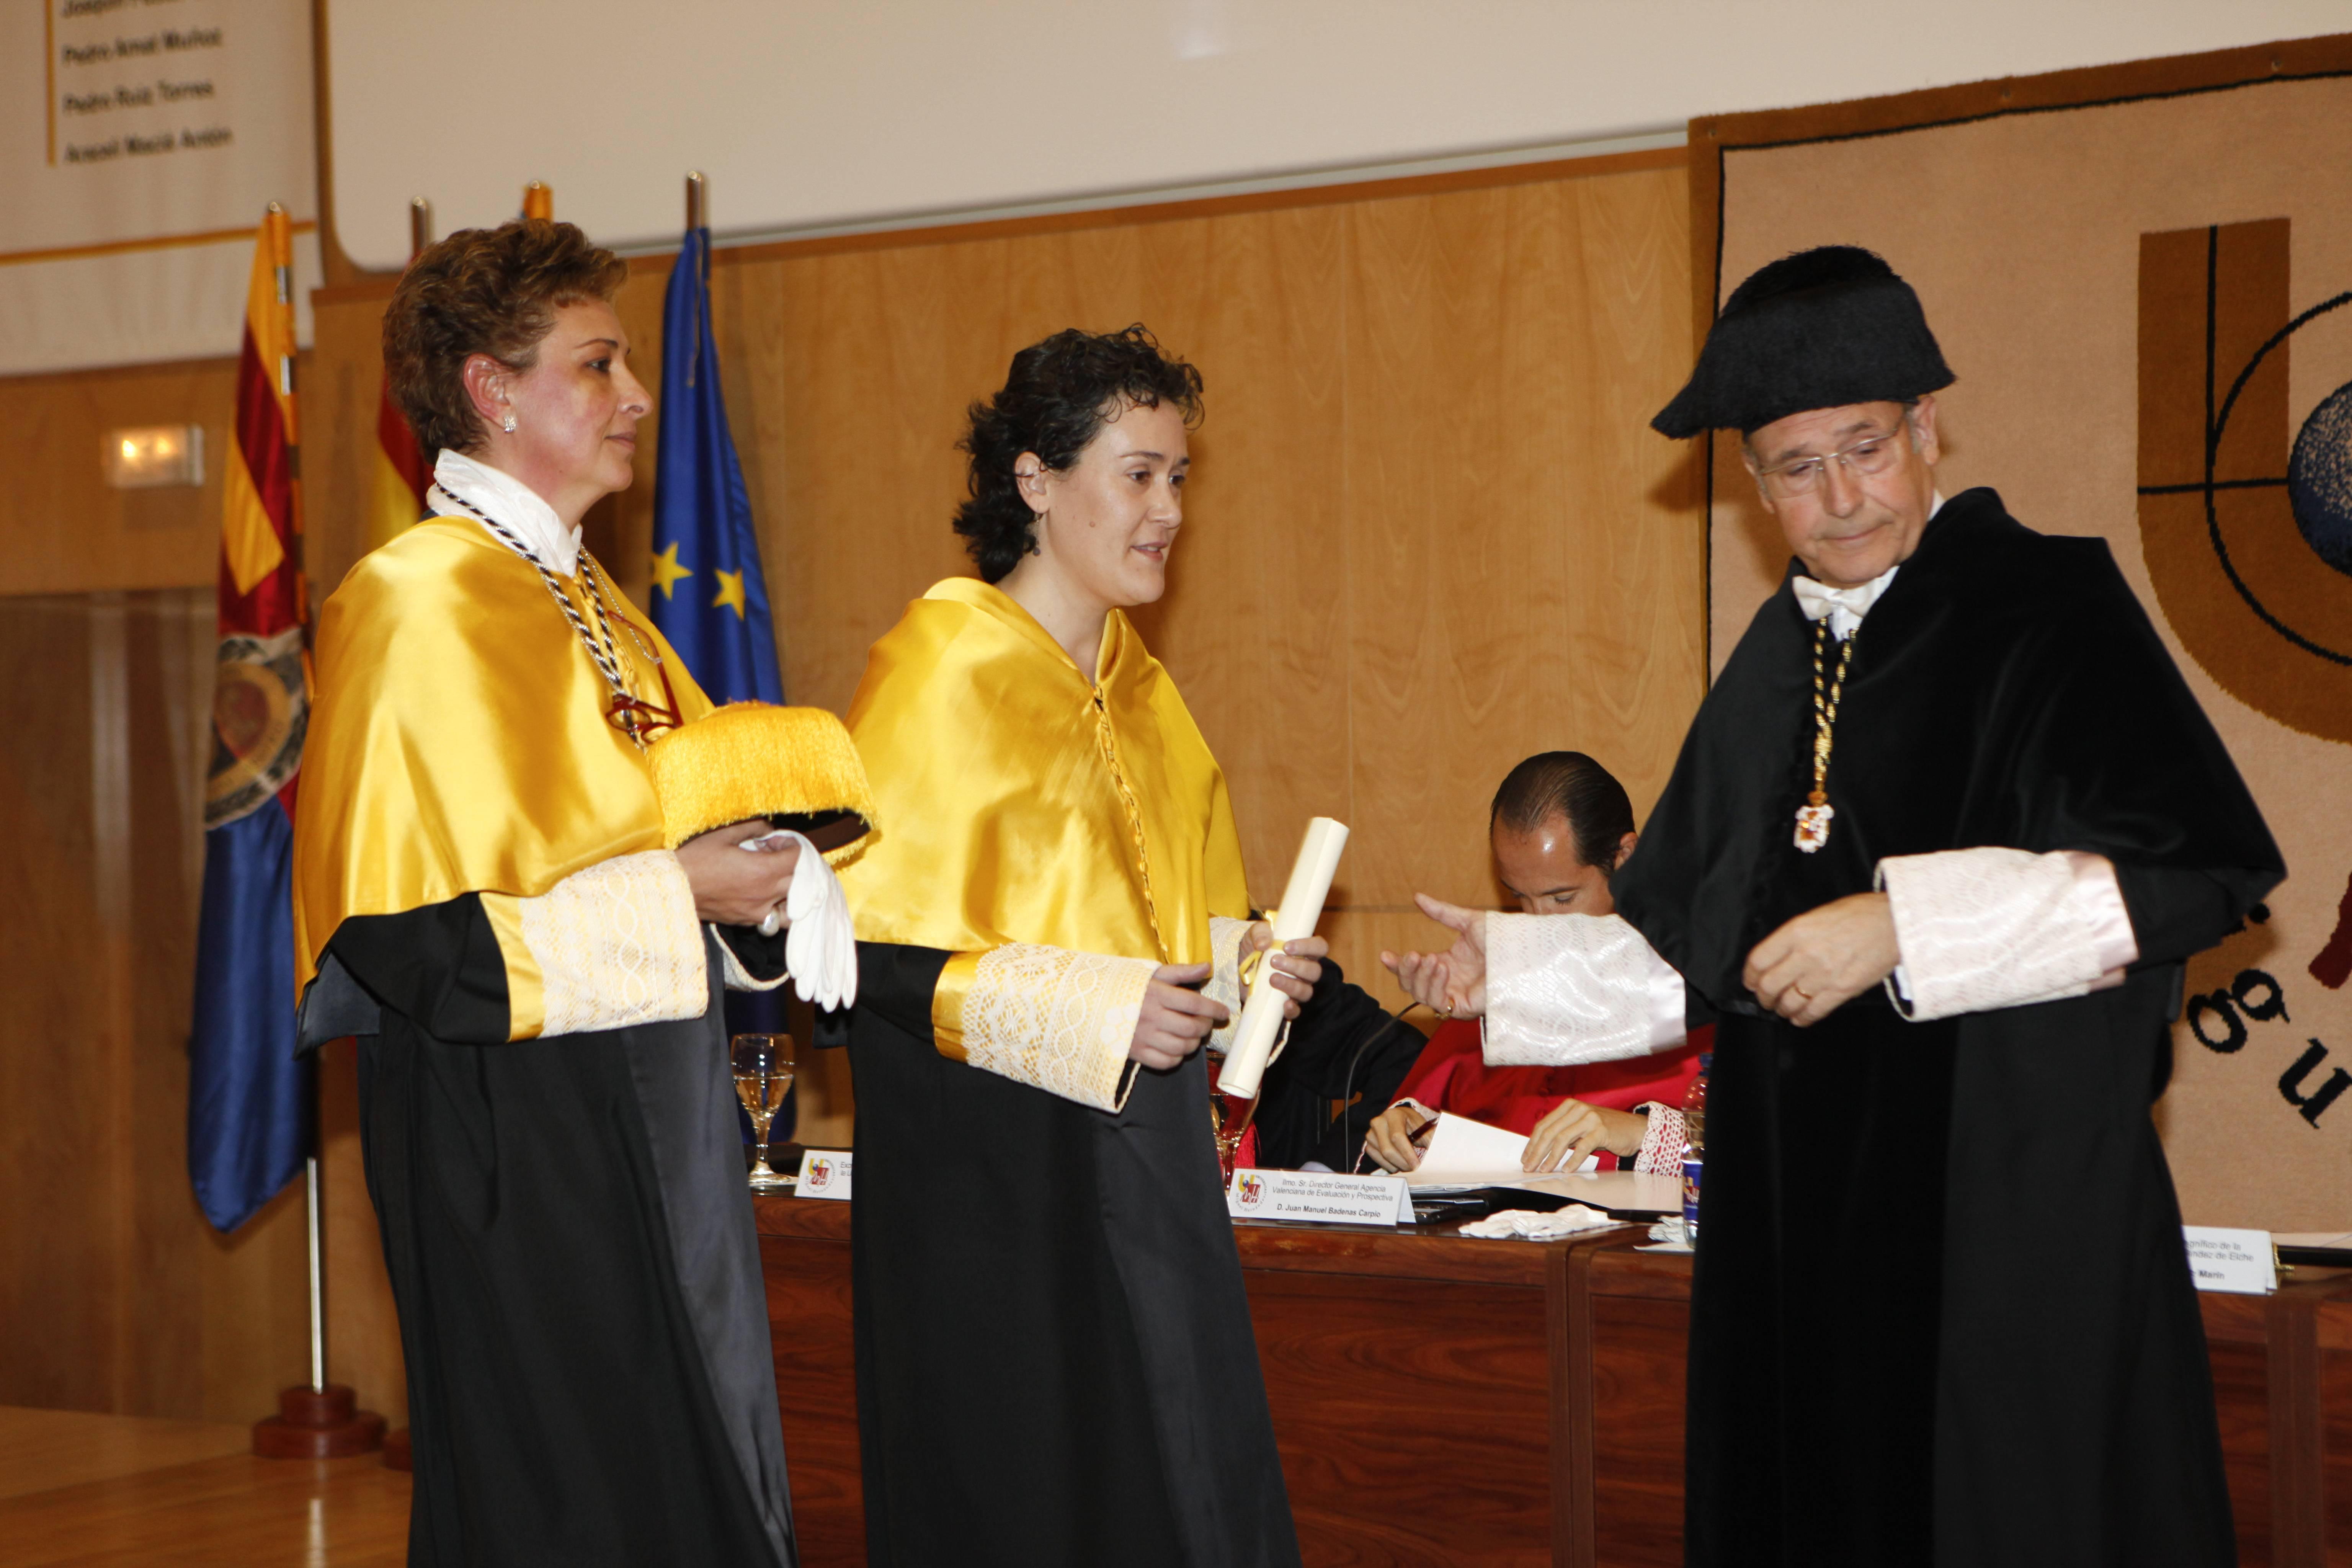 doctor-honoris-causa-luis-gamir_mg_1132.jpg